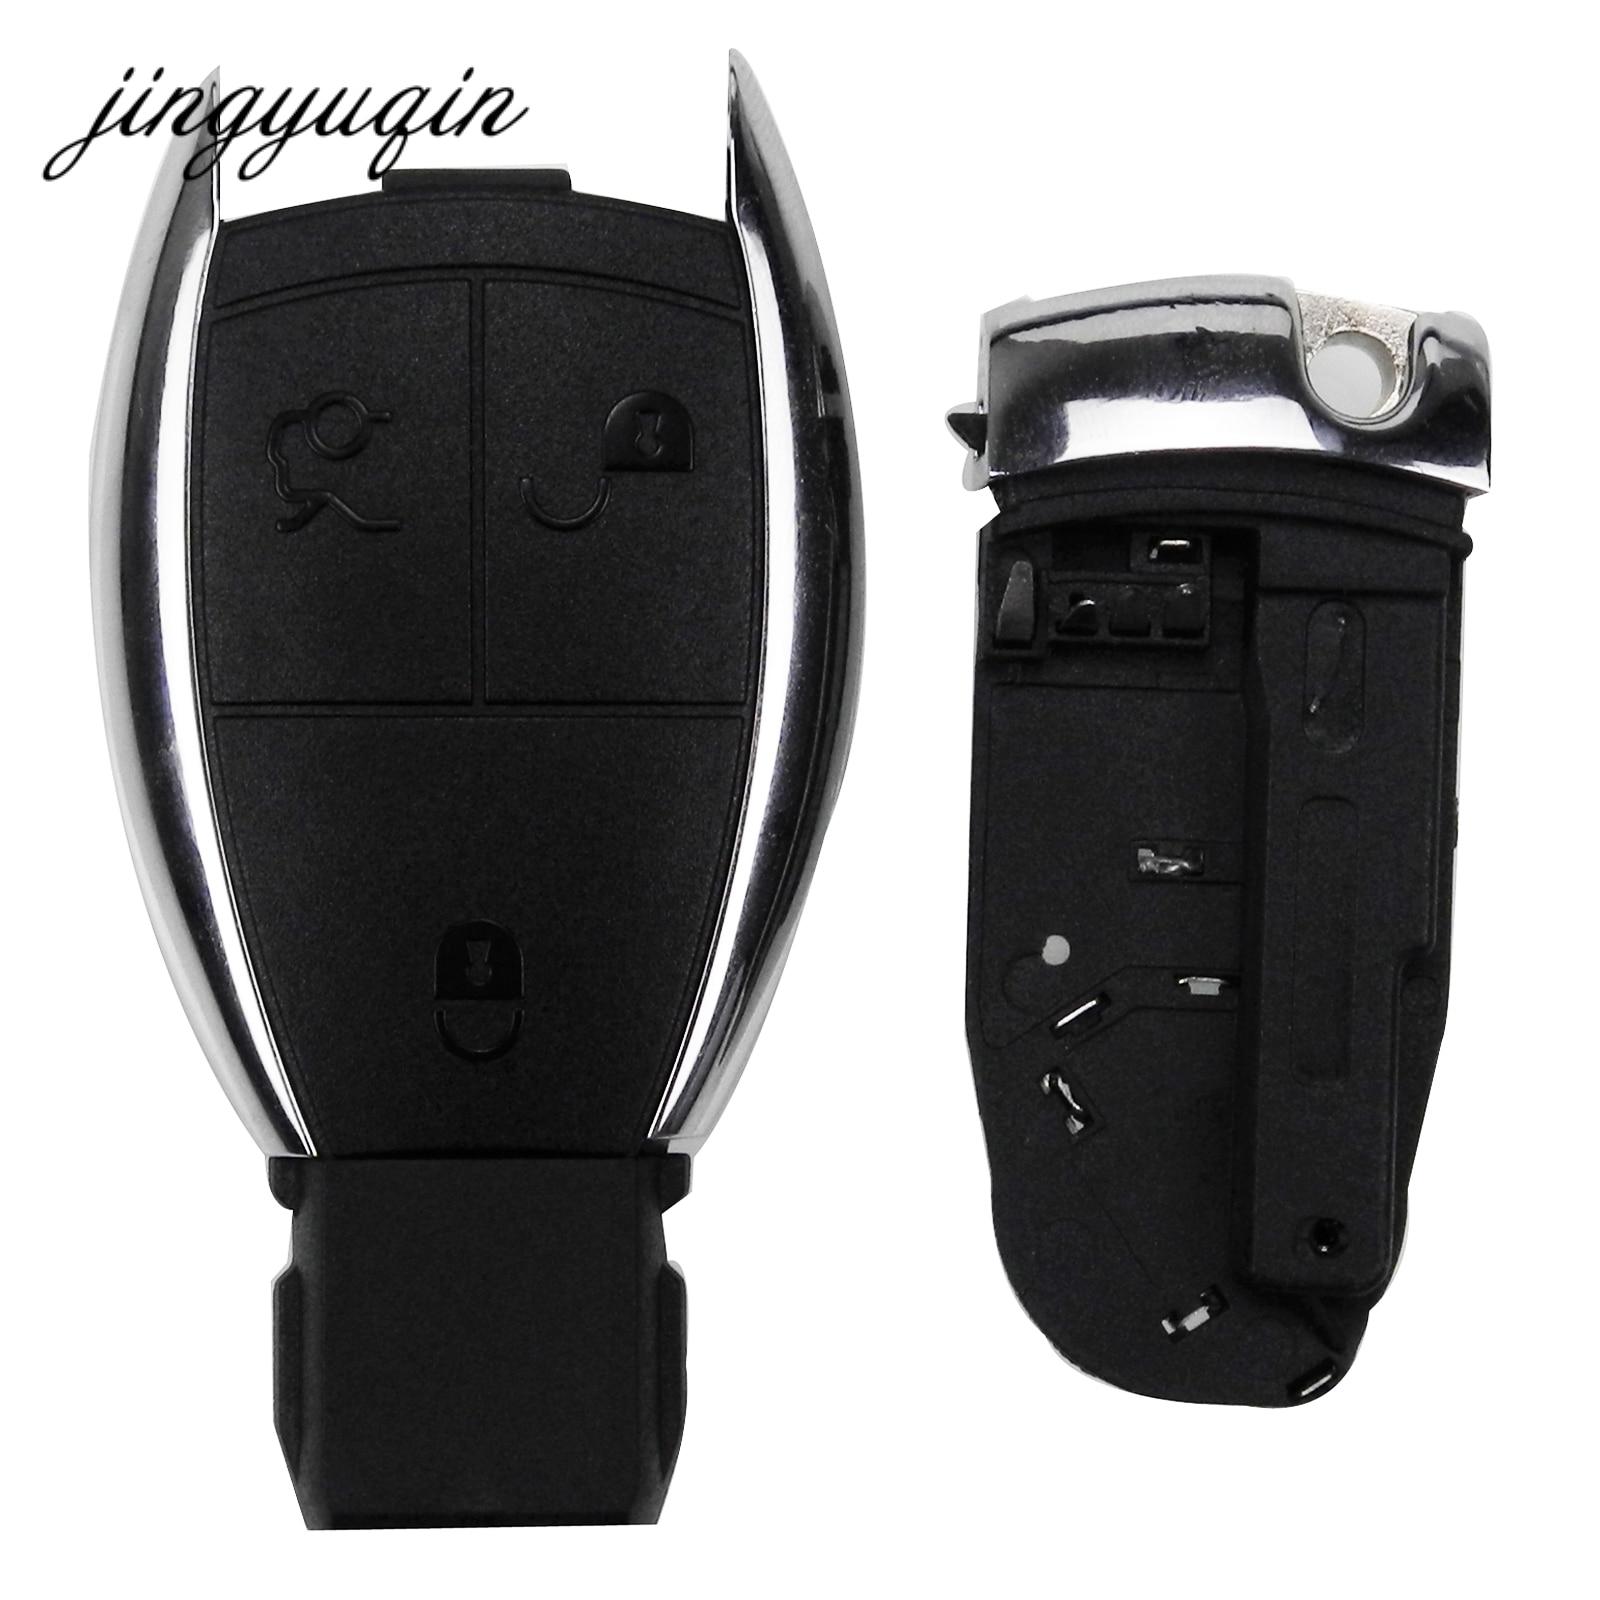 Jingyuqin für MERCEDES 3 Taste Remote Auto Schlüssel Fall Fob Shell für BENZ C E R S CL GL SL CLK SLK W203 fob + Batterie Halter Clamp